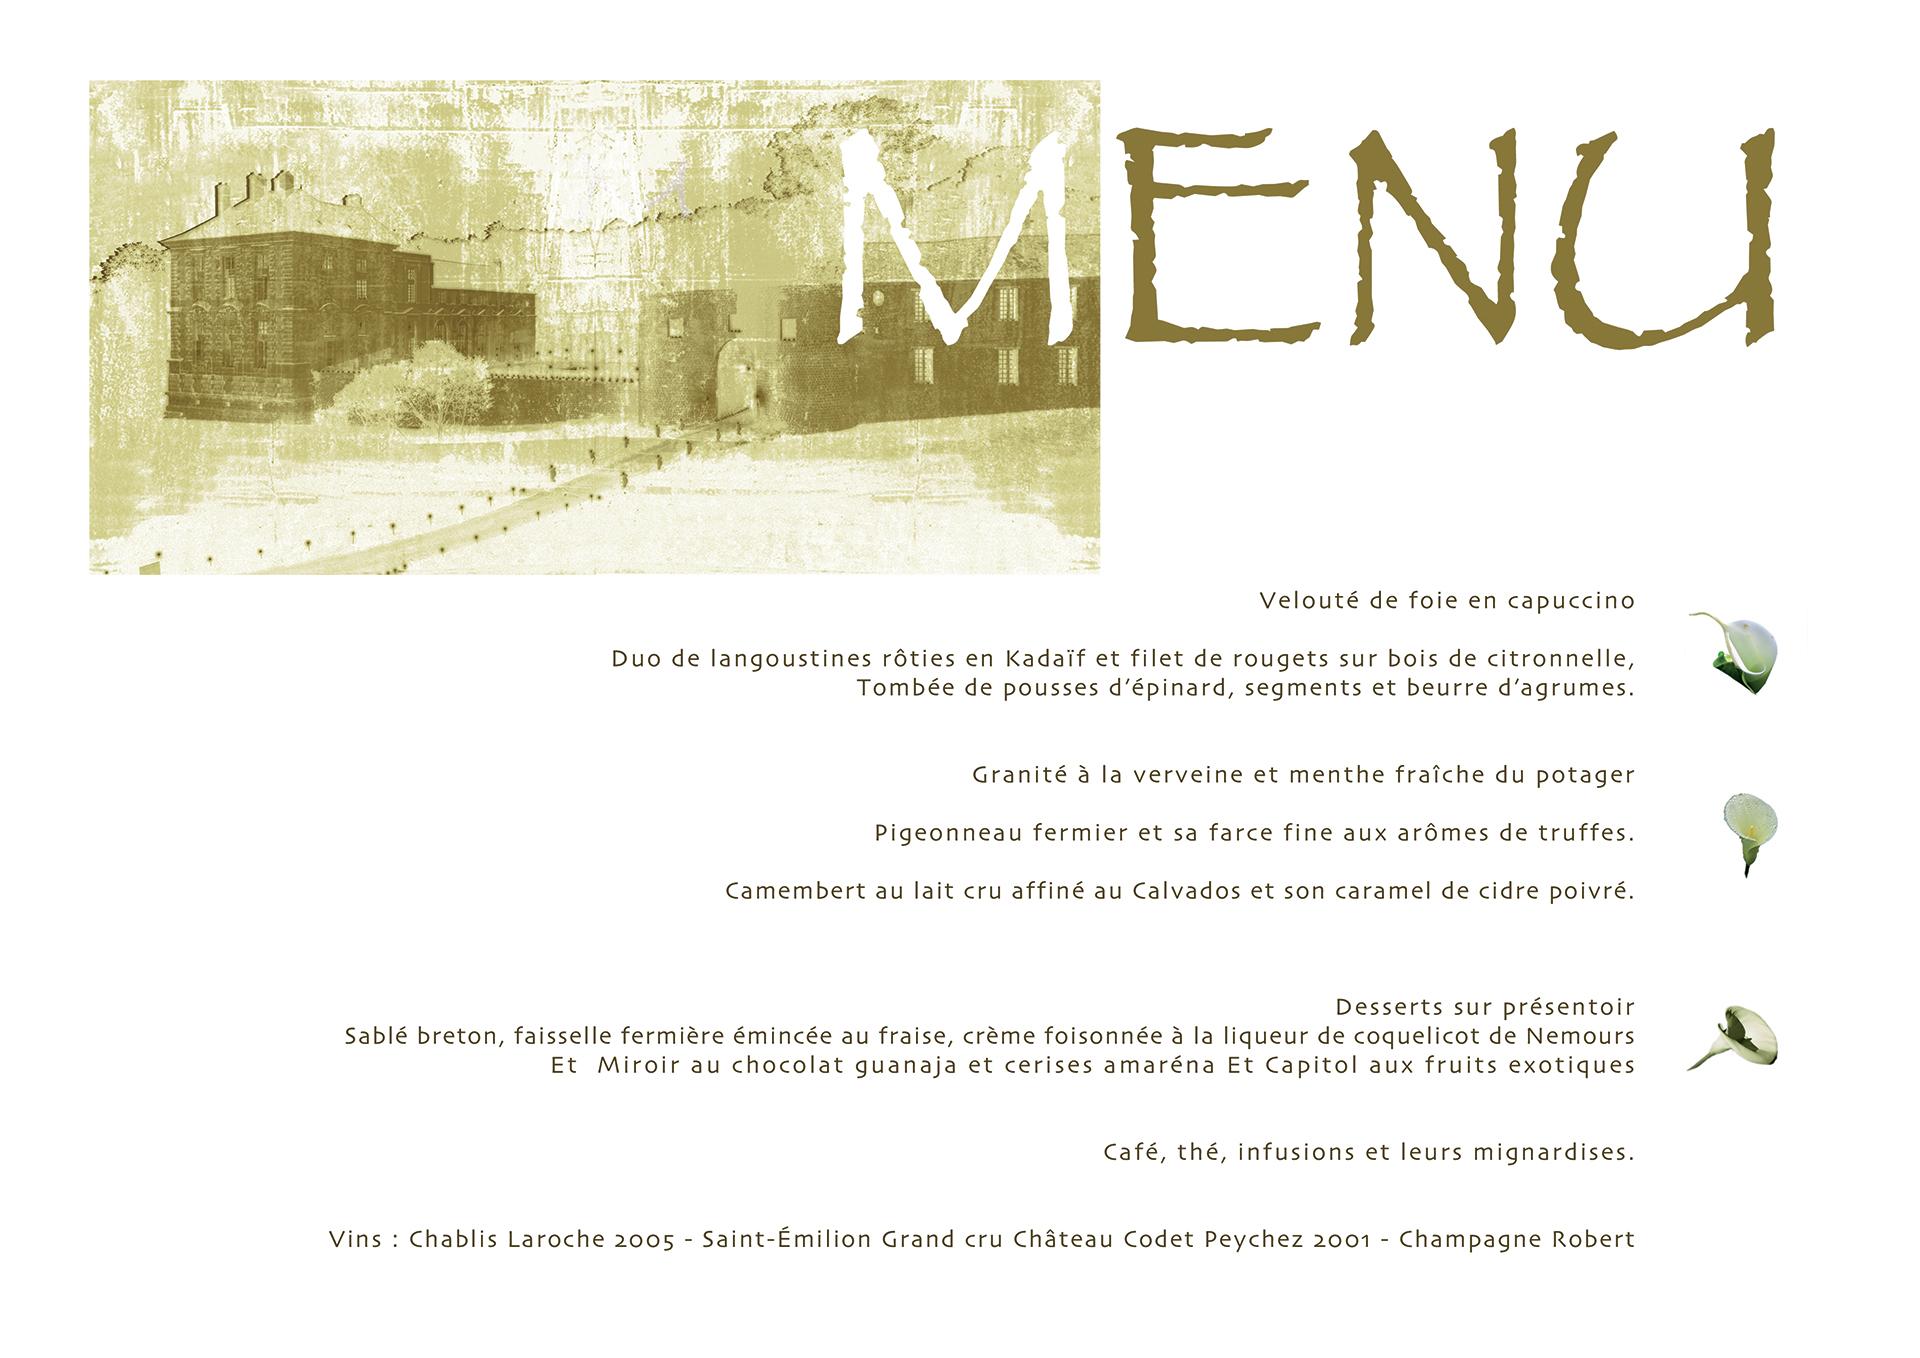 menu imprimé d'un dîner de mariage au château de Vallery